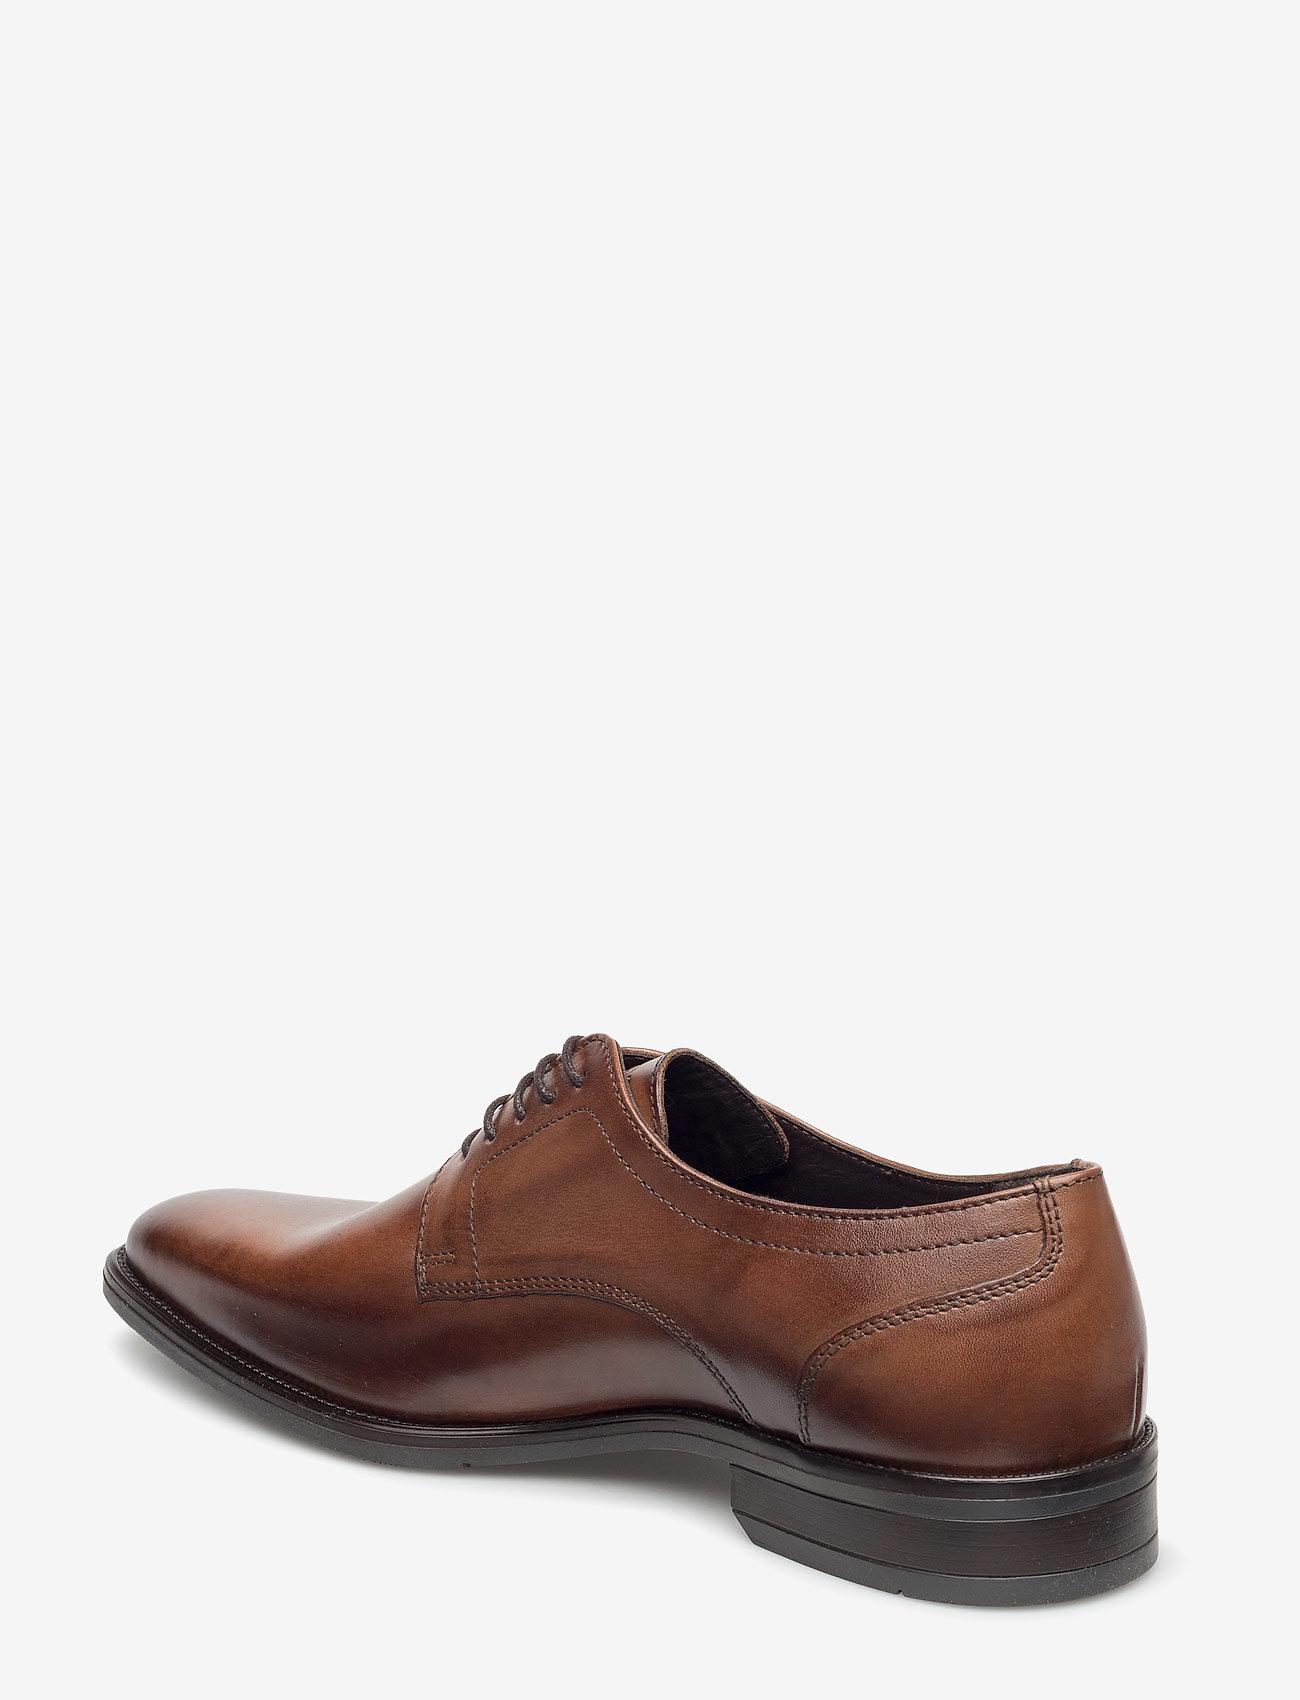 6508 (Brown) - Playboy Footwear 4g0dzv